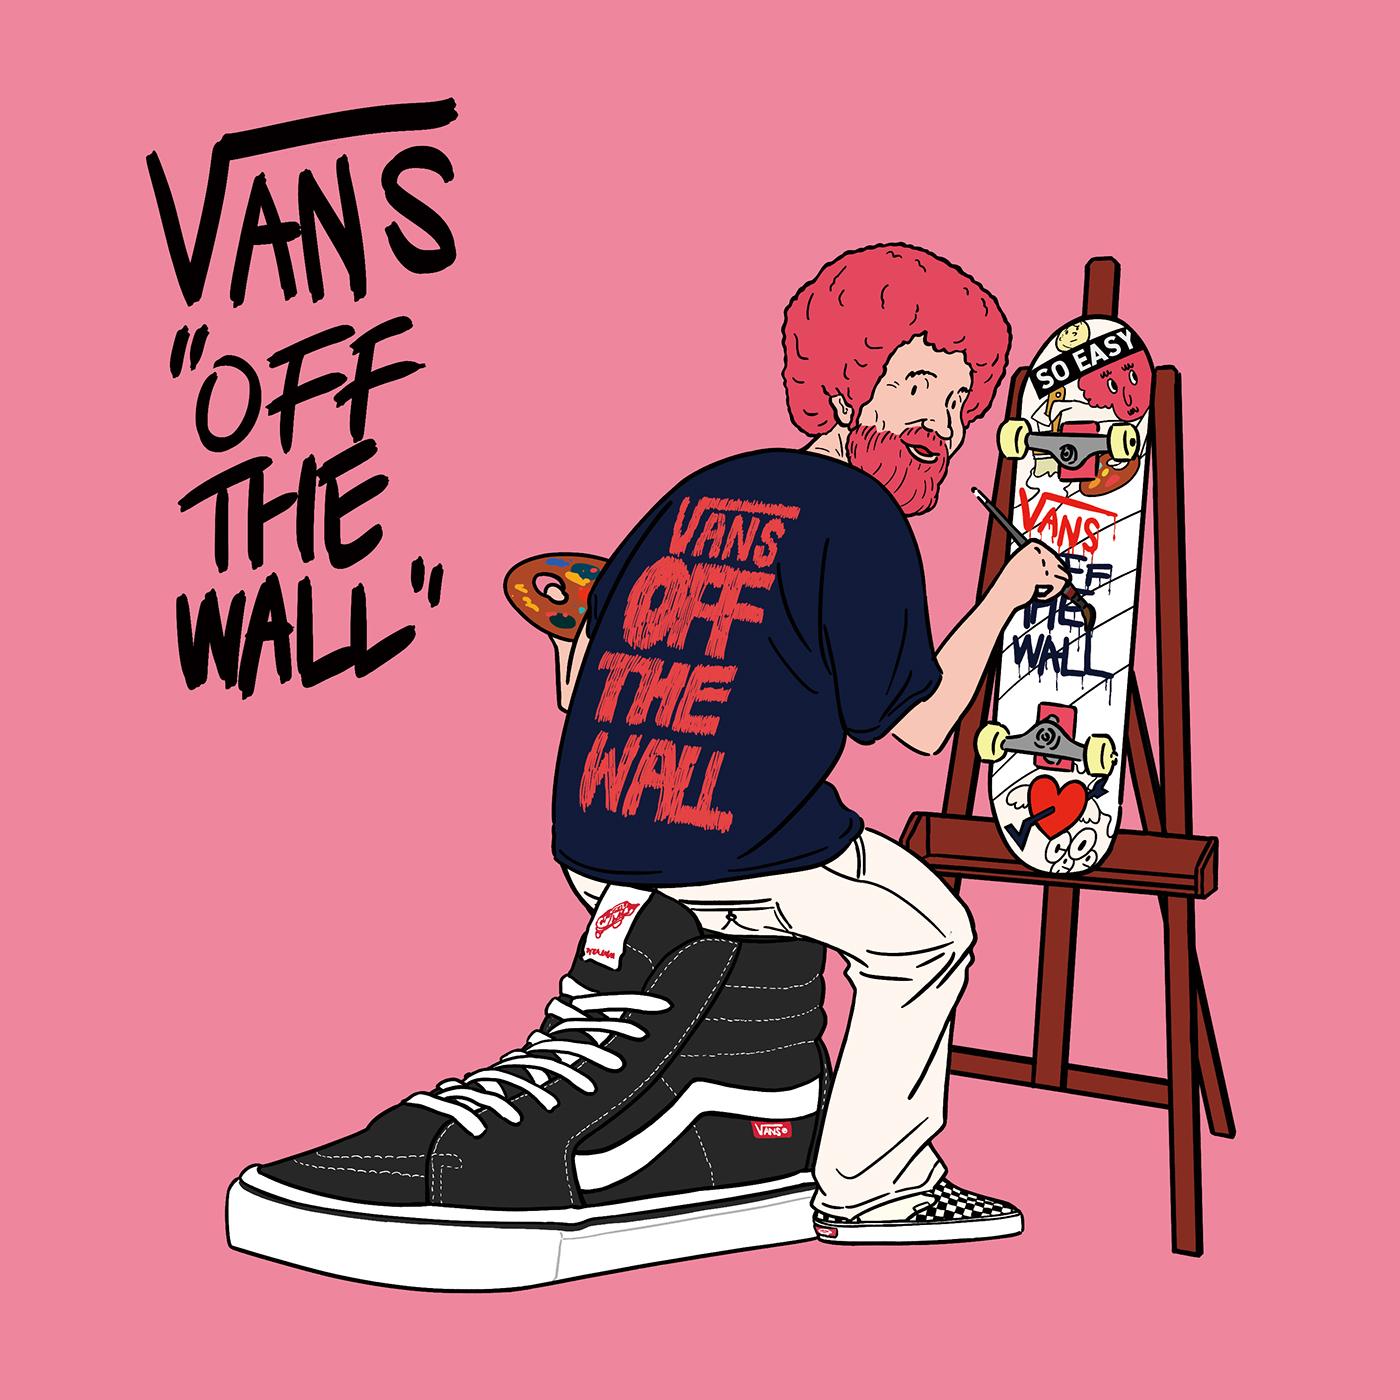 c0b7124515 VANS OFF THE WALL - vans artist on Behance